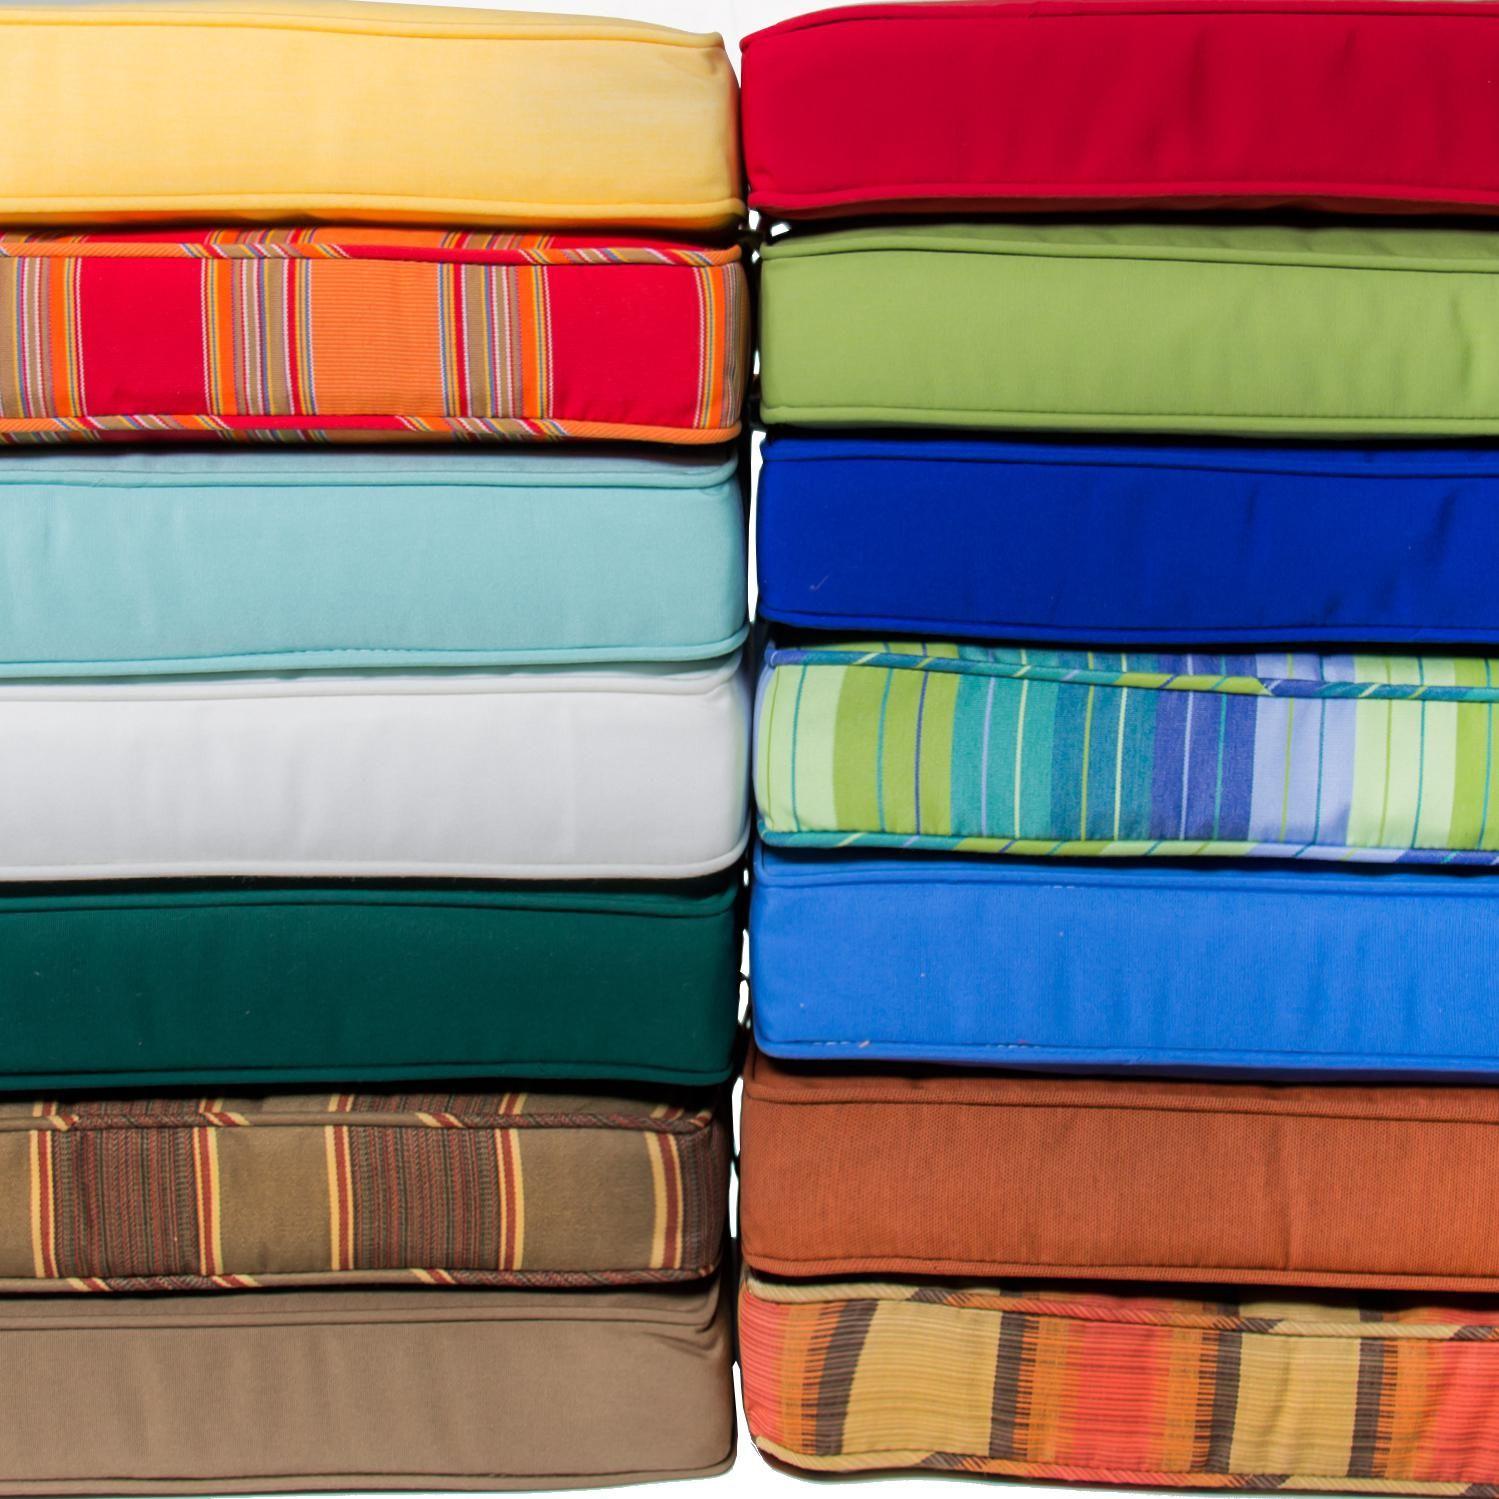 Portrayal of Sunbrella Replacement Cushions Indoor and Outdoor Functions - Portrayal Of Sunbrella Replacement Cushions Indoor And Outdoor